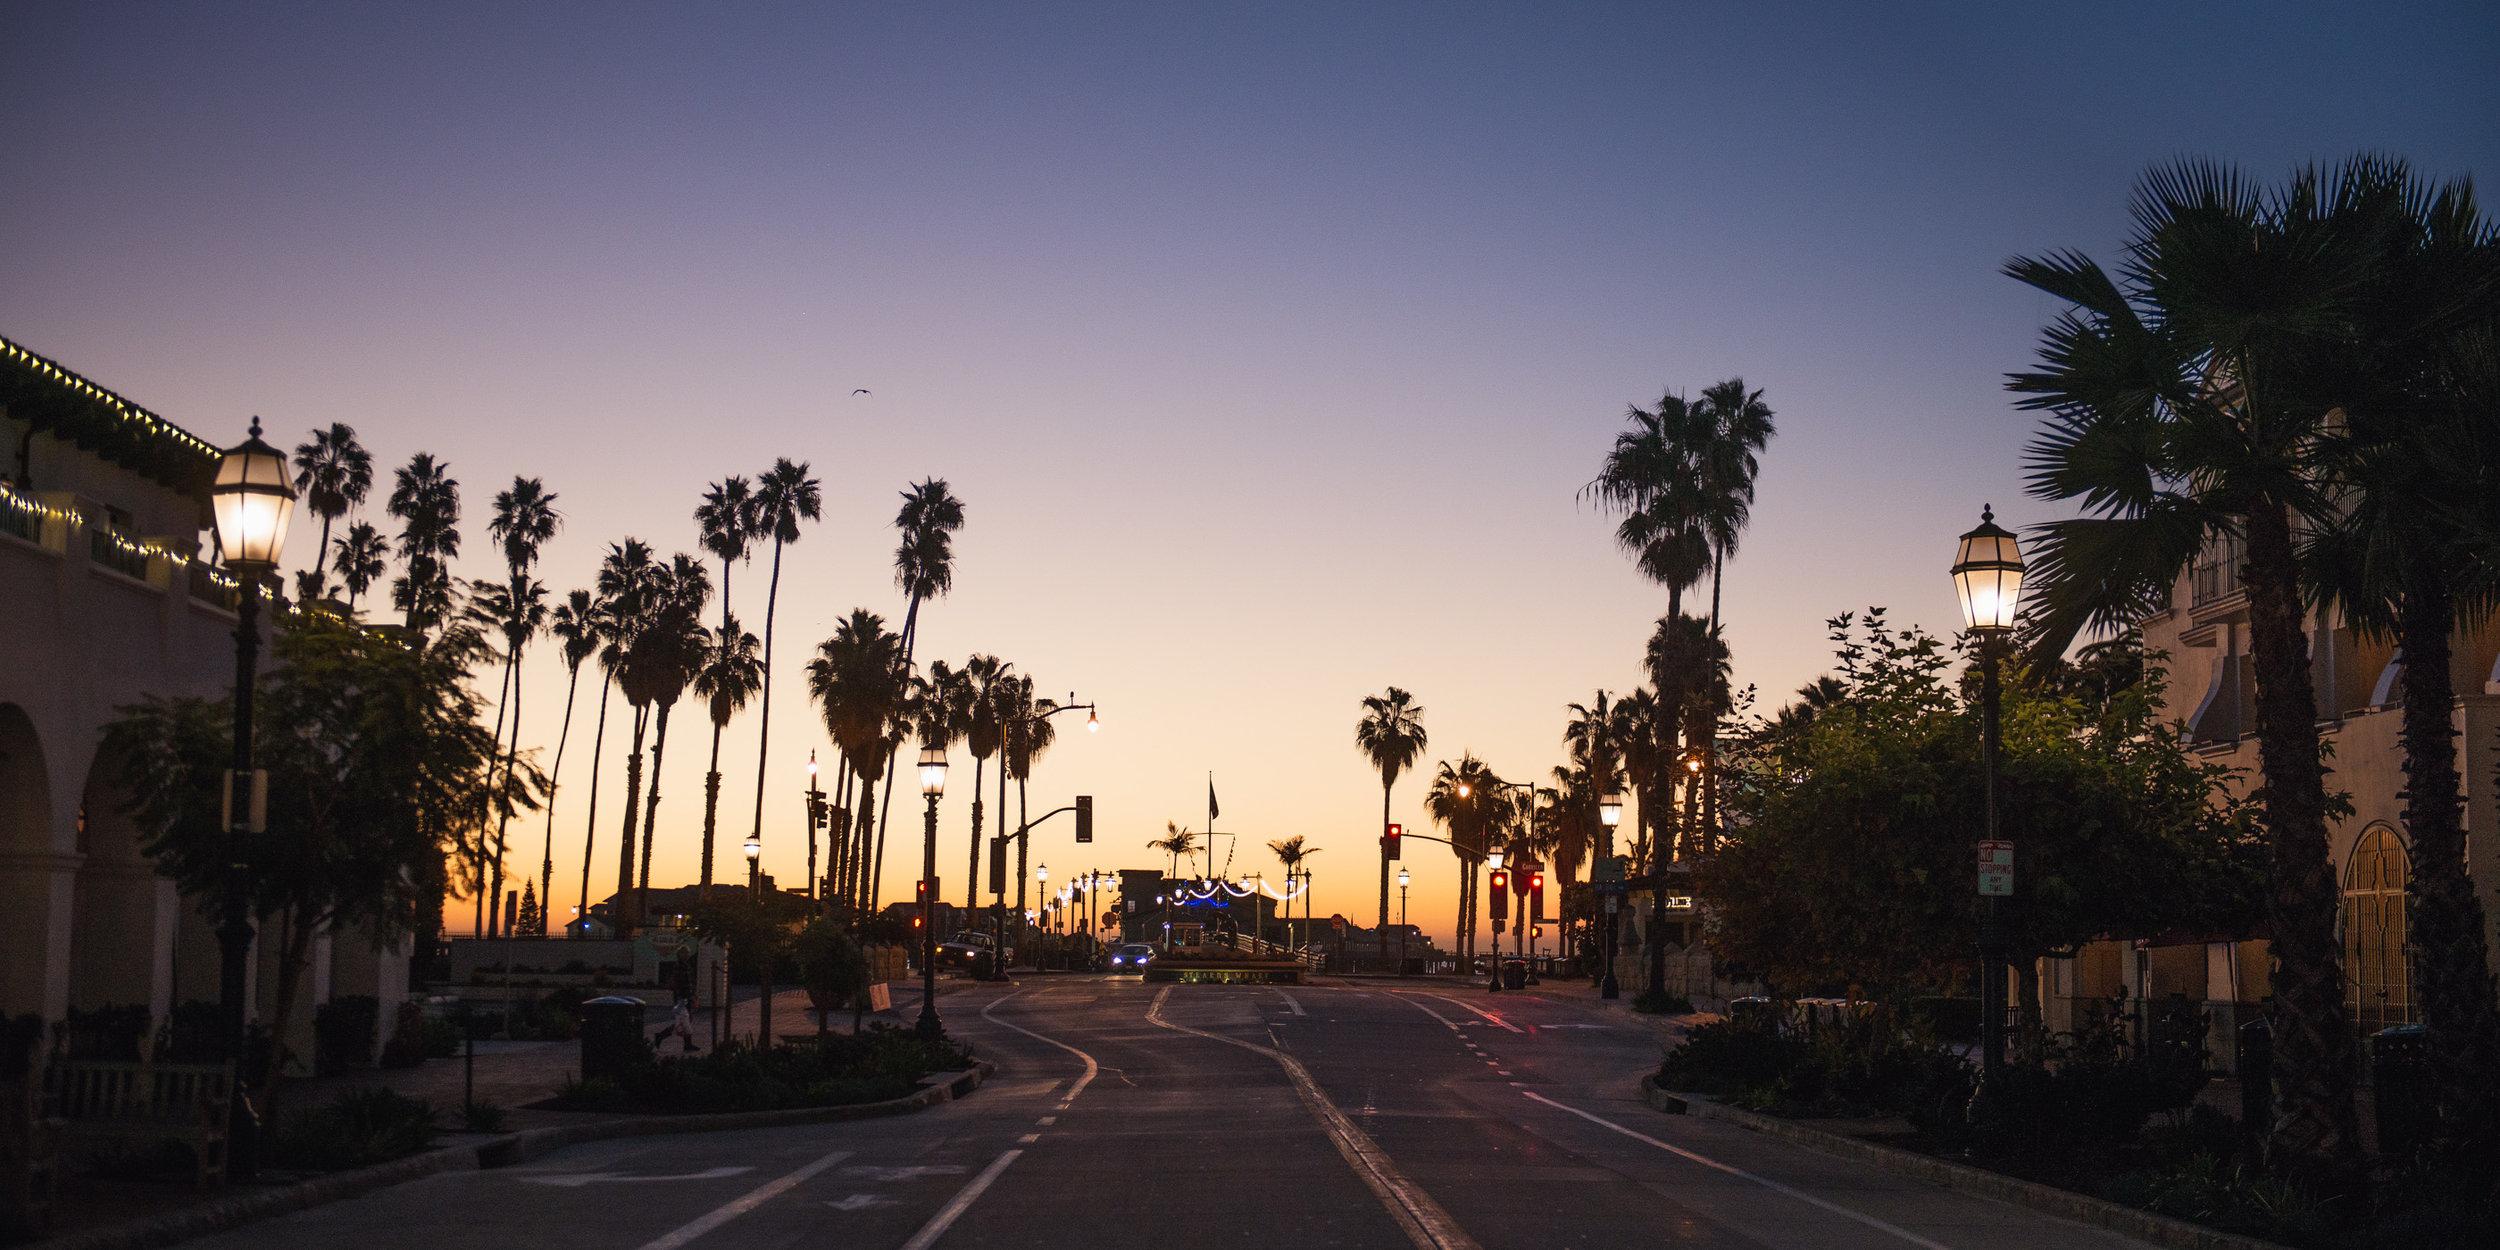 Harbor View Inn - California Hotel Hospitality Photography